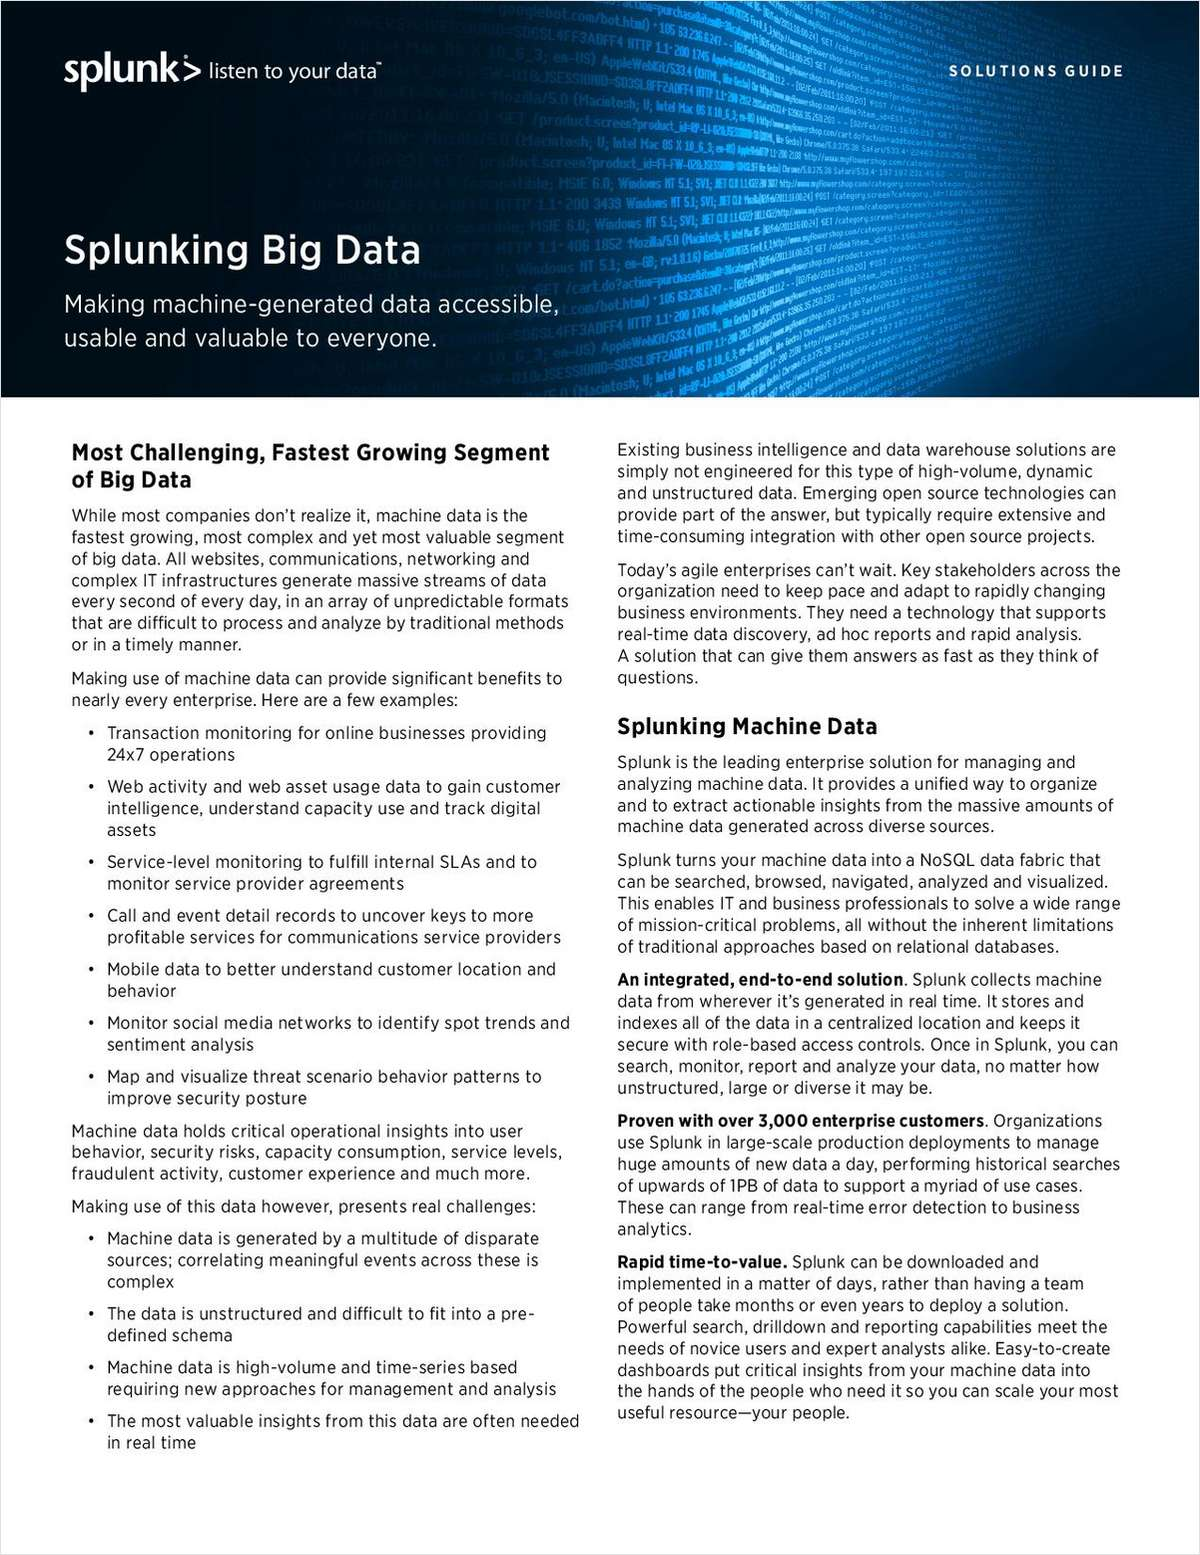 Splunk for Big Data